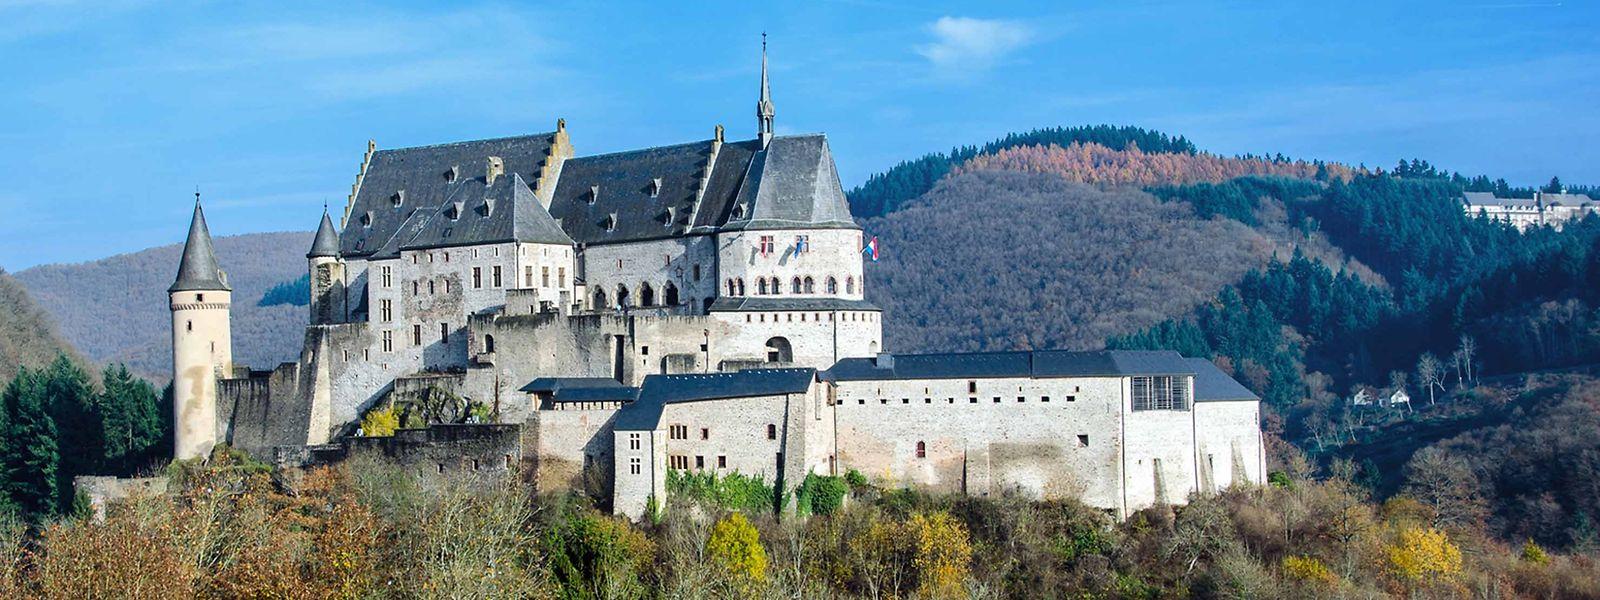 Das Schloss Vianden im Norden Luxemburgs.